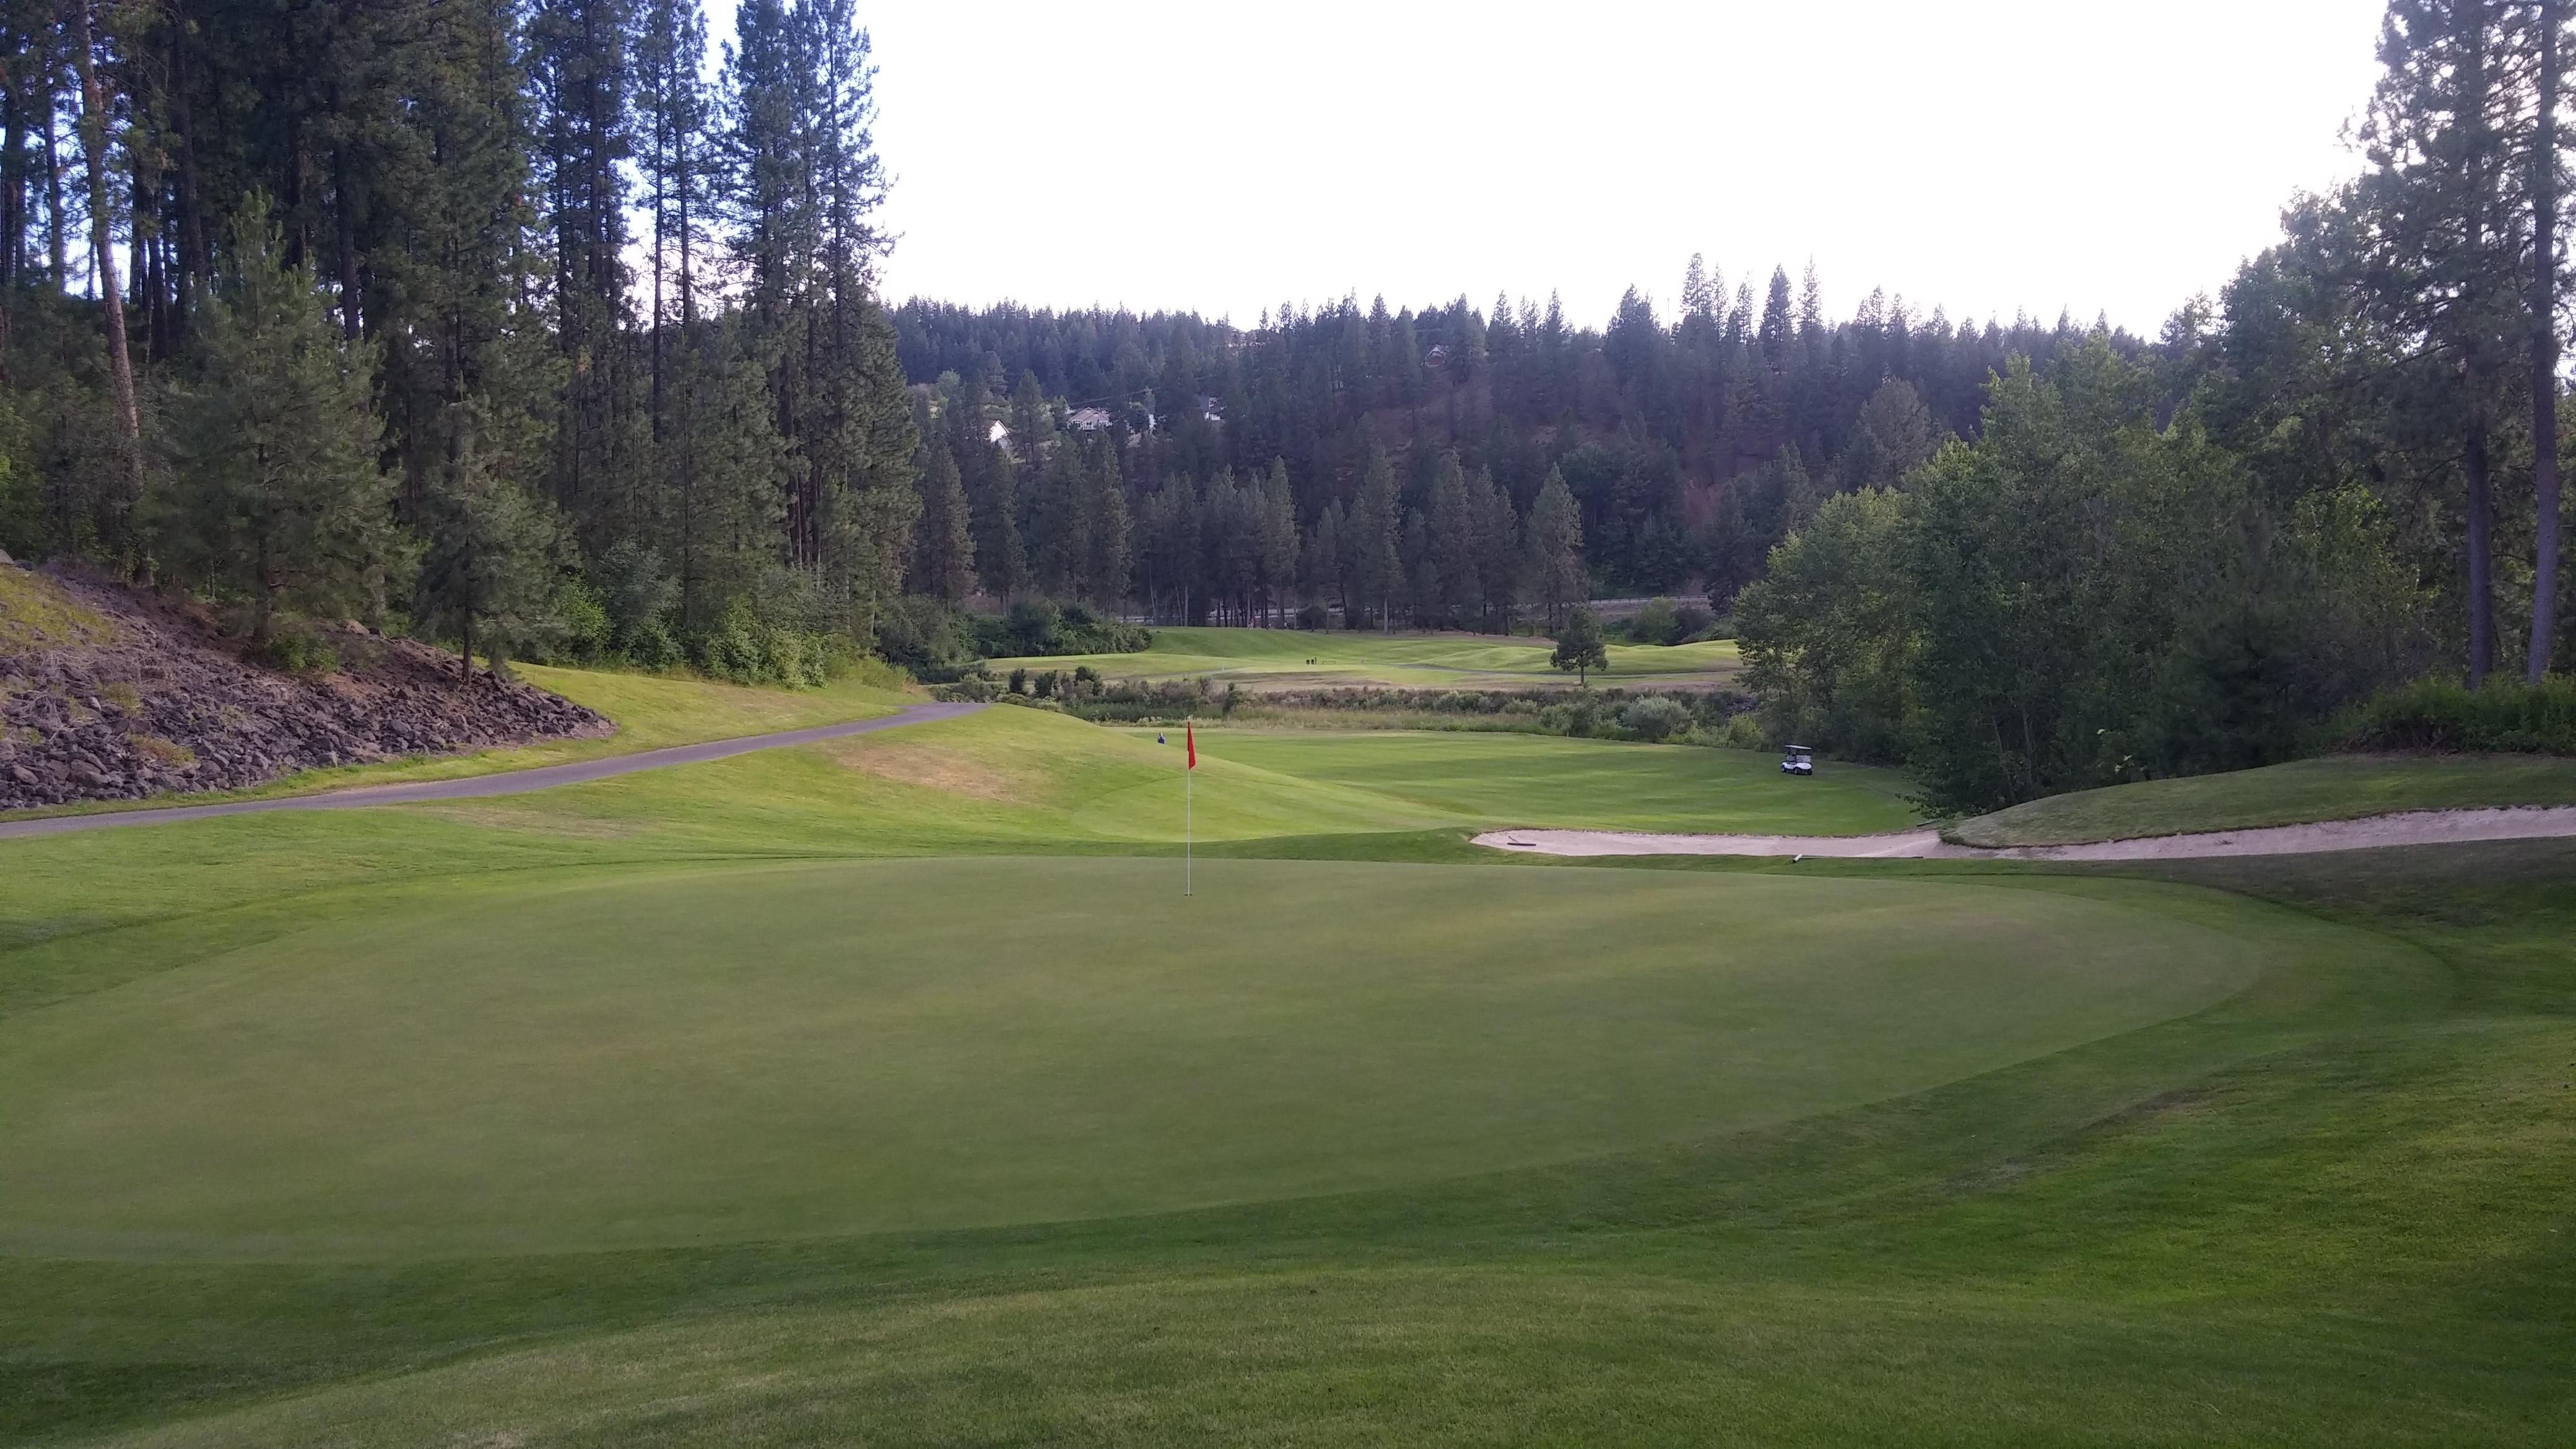 AIA|CSI 2020 Golf Tournament gallery image #7